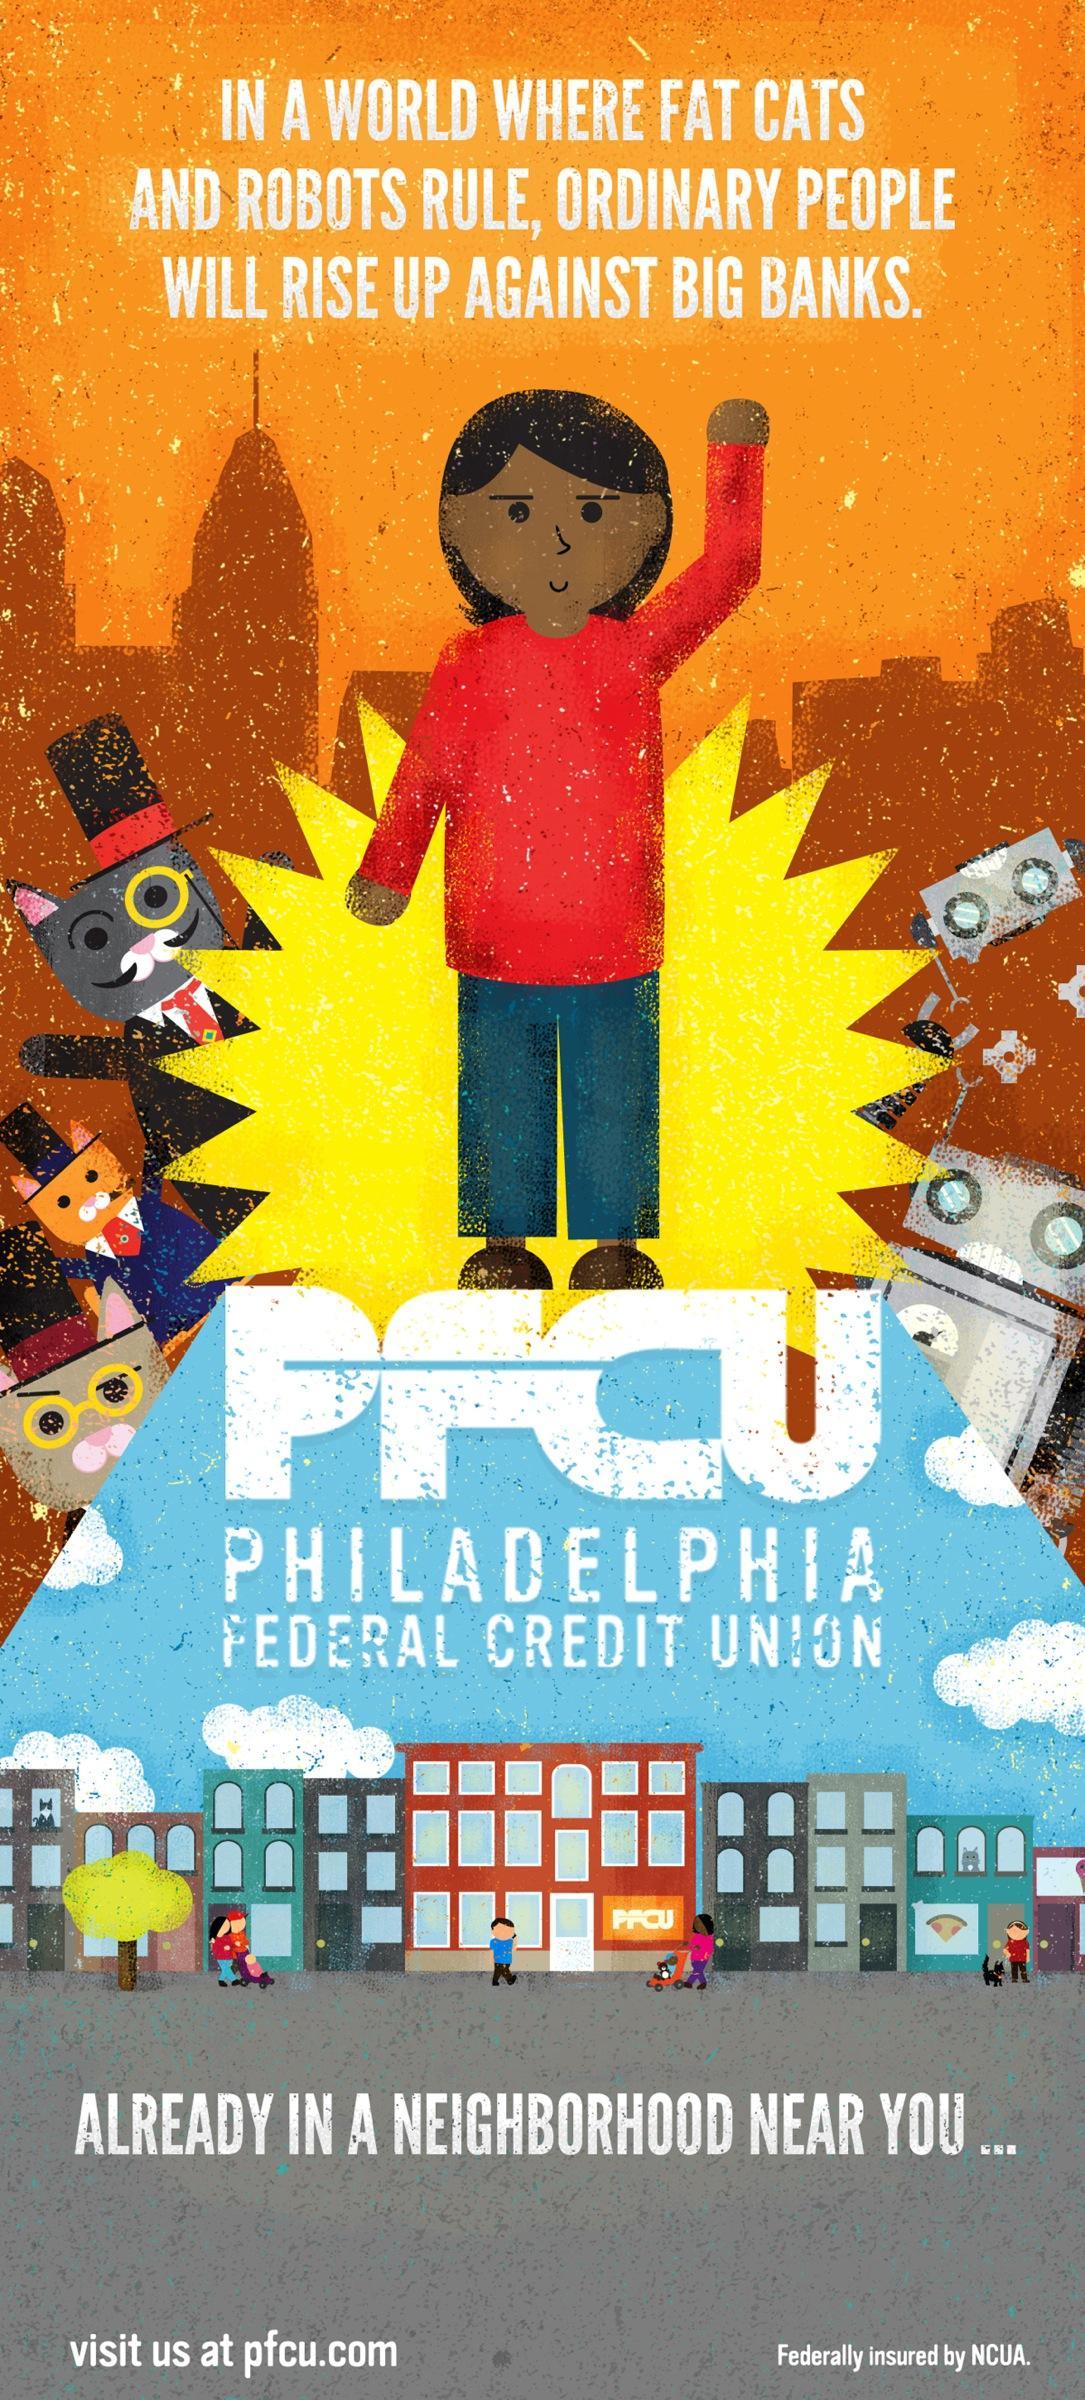 Philadelphia Federal Credit Union Print Ad -  Fat cats